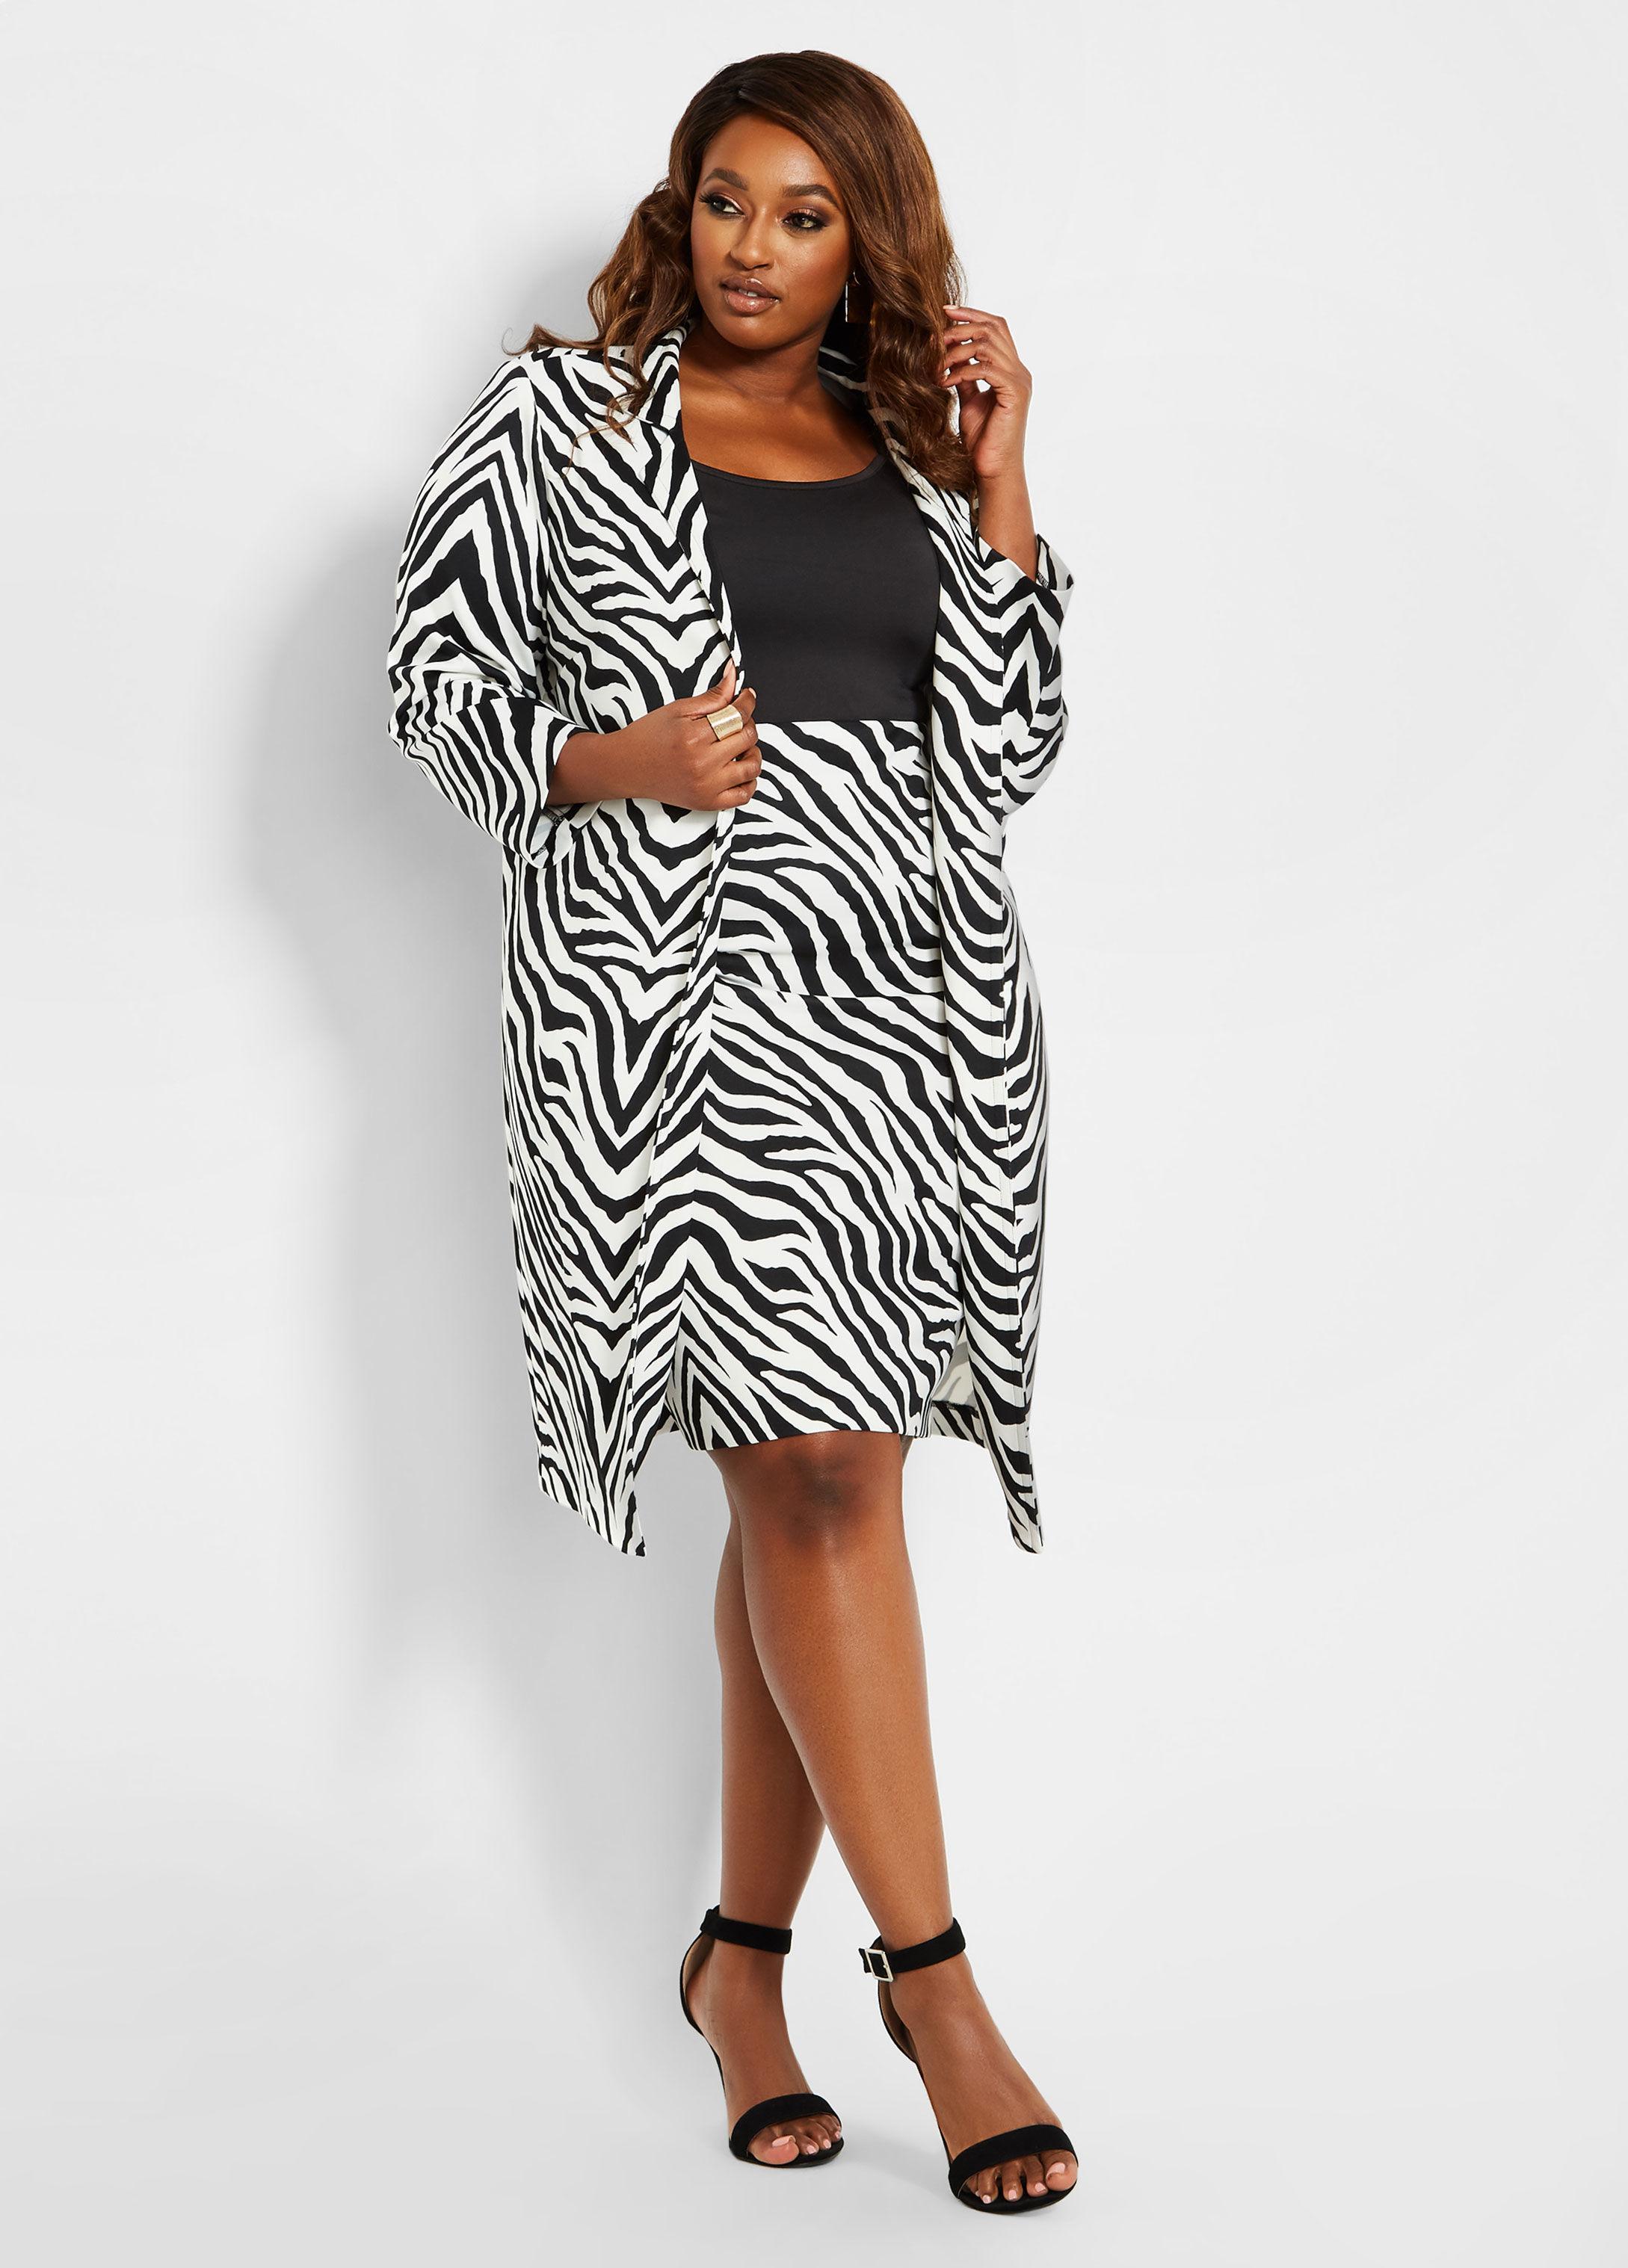 88b7706b66594 Lyst - Ashley Stewart Plus Size Zebra Print Long Line Topper in Black